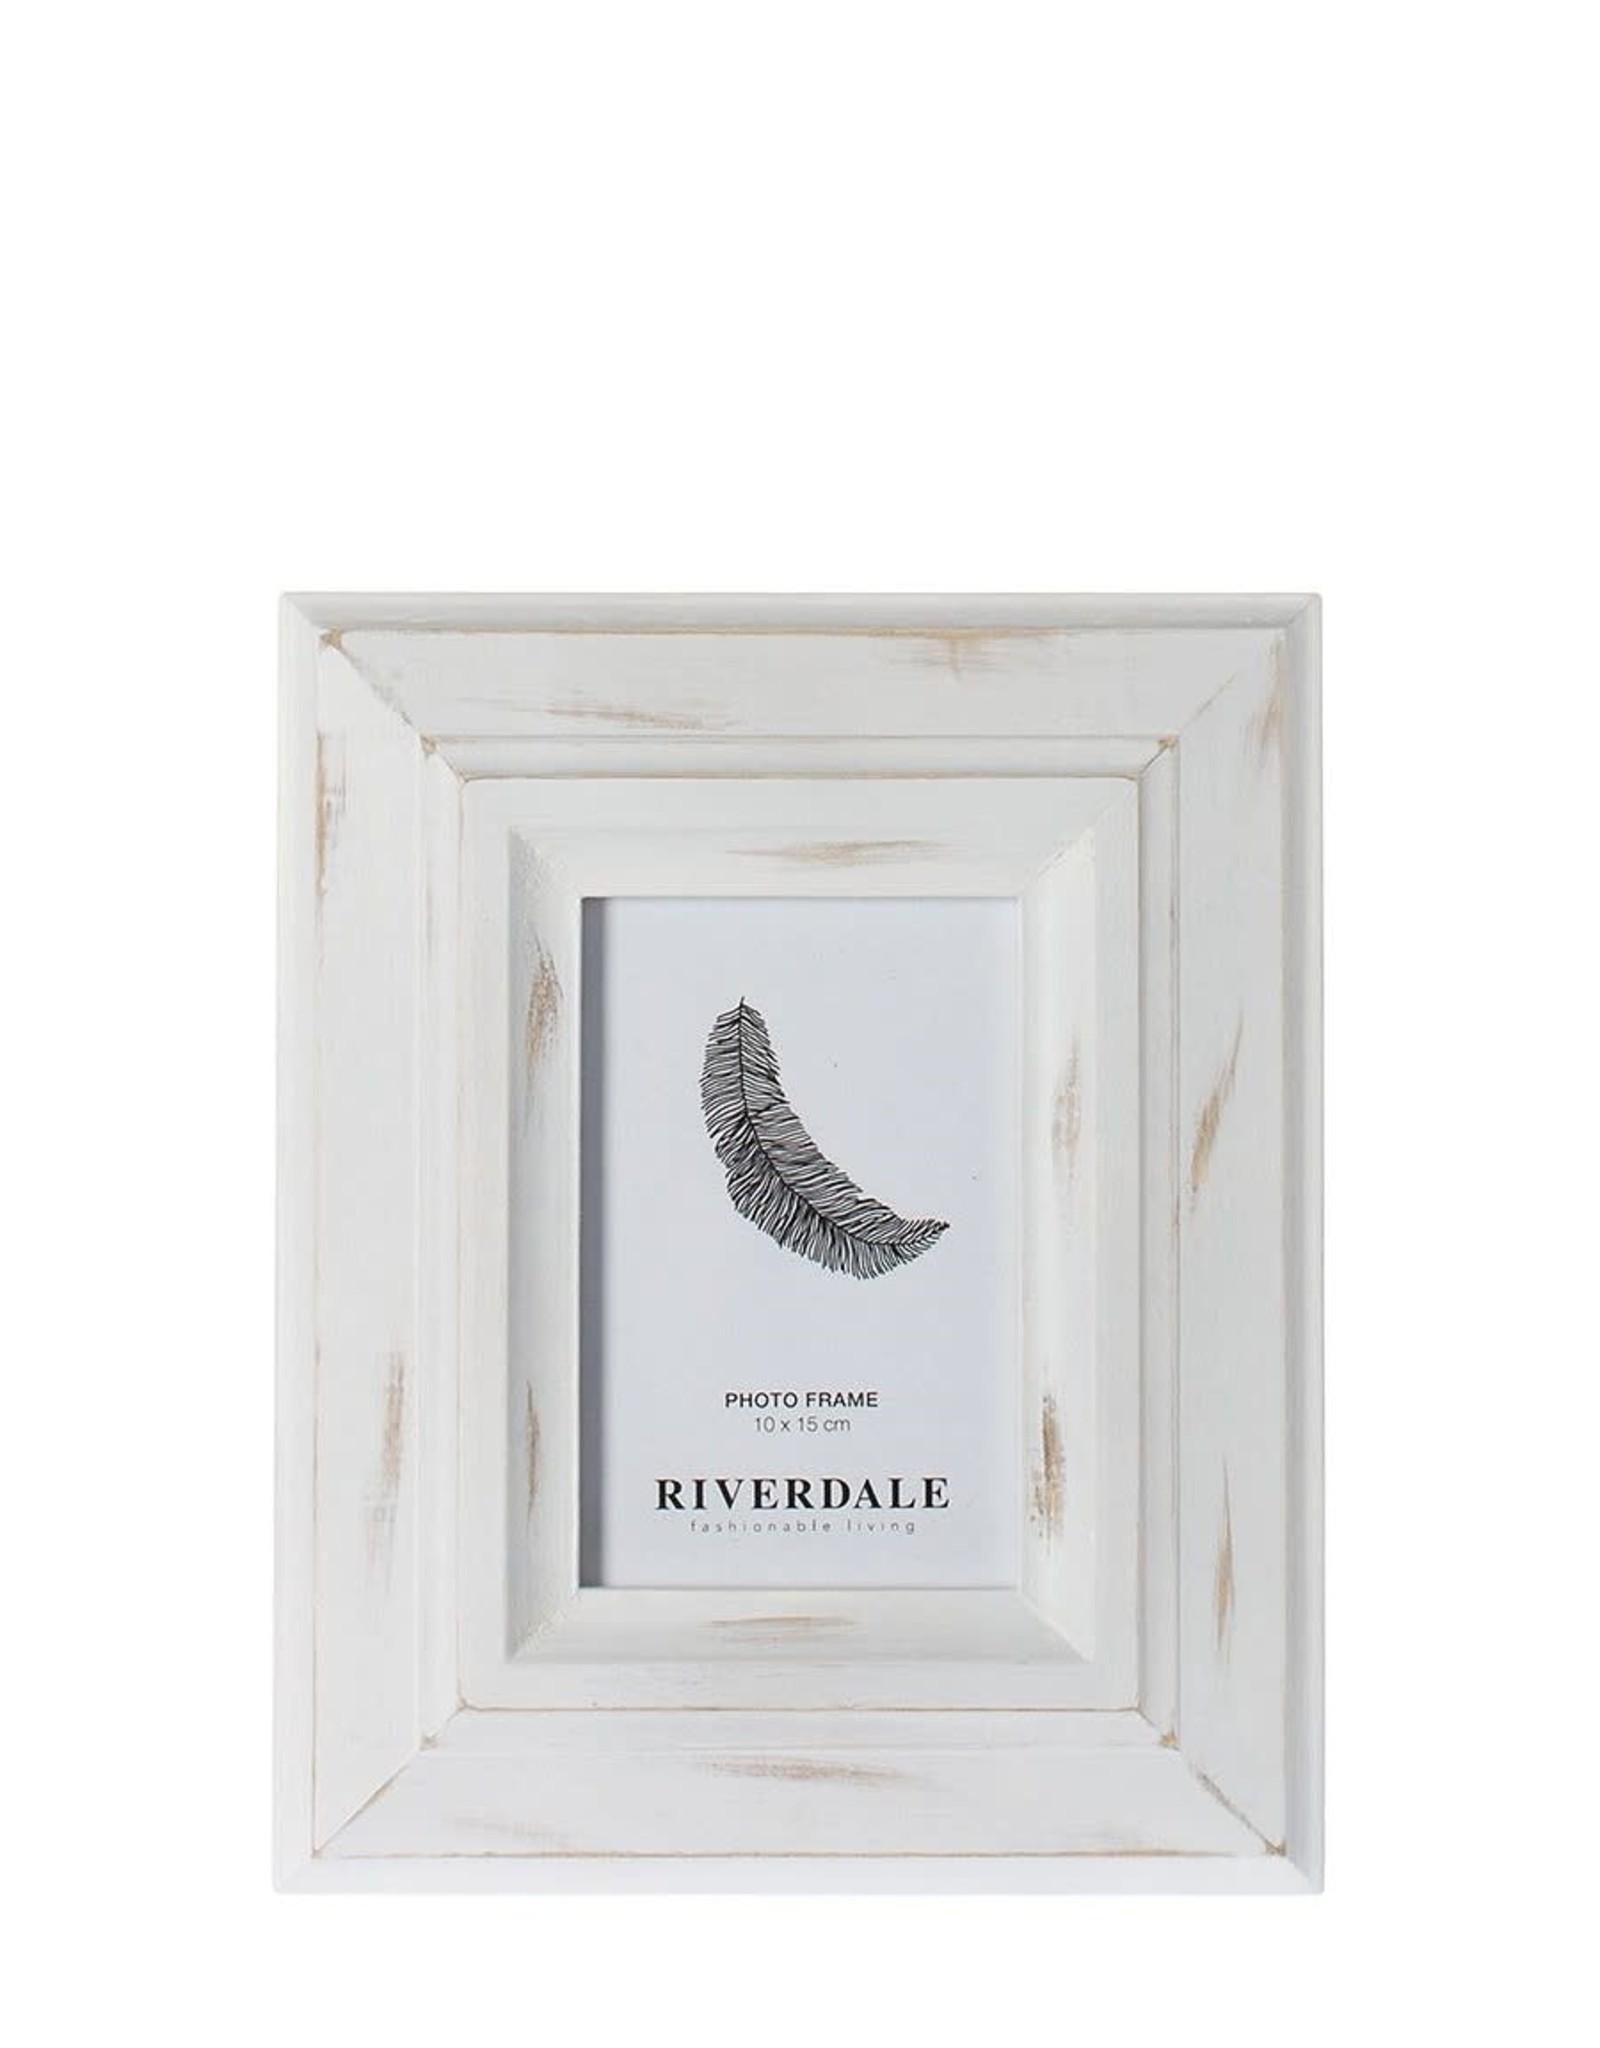 Riverdale FOTOLIJST MEMPHIS WHITE 10X15CM (kader 7)